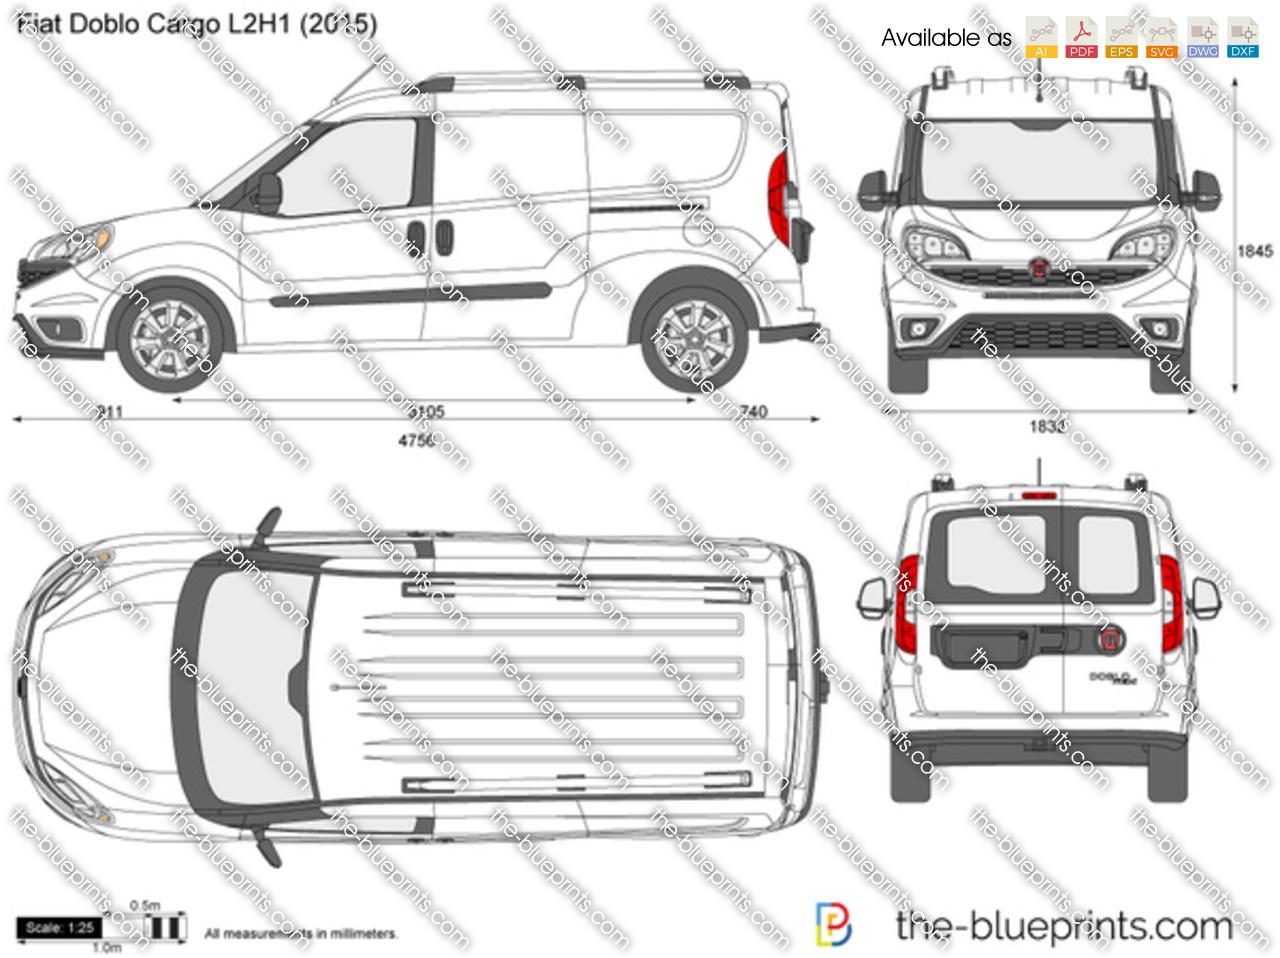 Fiat Doblo Cargo L2H1 vector drawing